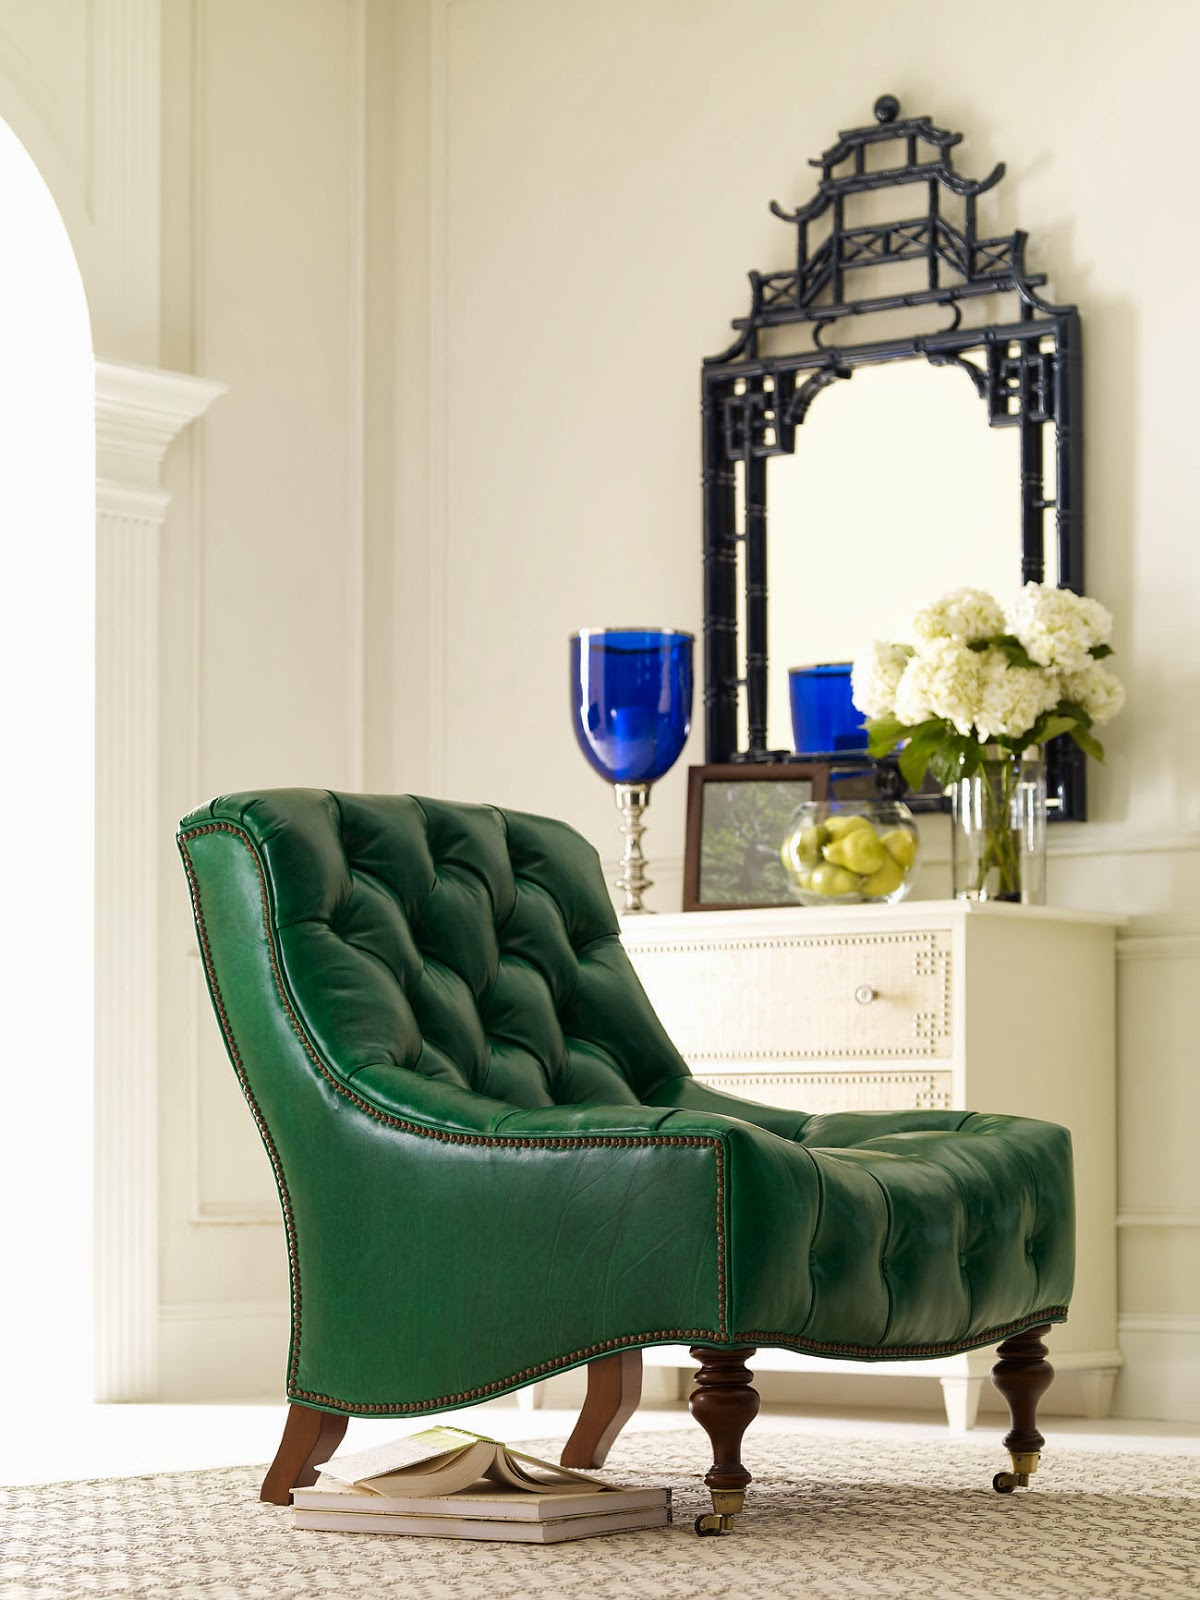 Barclay Buterra for Highland House. Lisa Mende Design  Barclay Buterra for Highland House